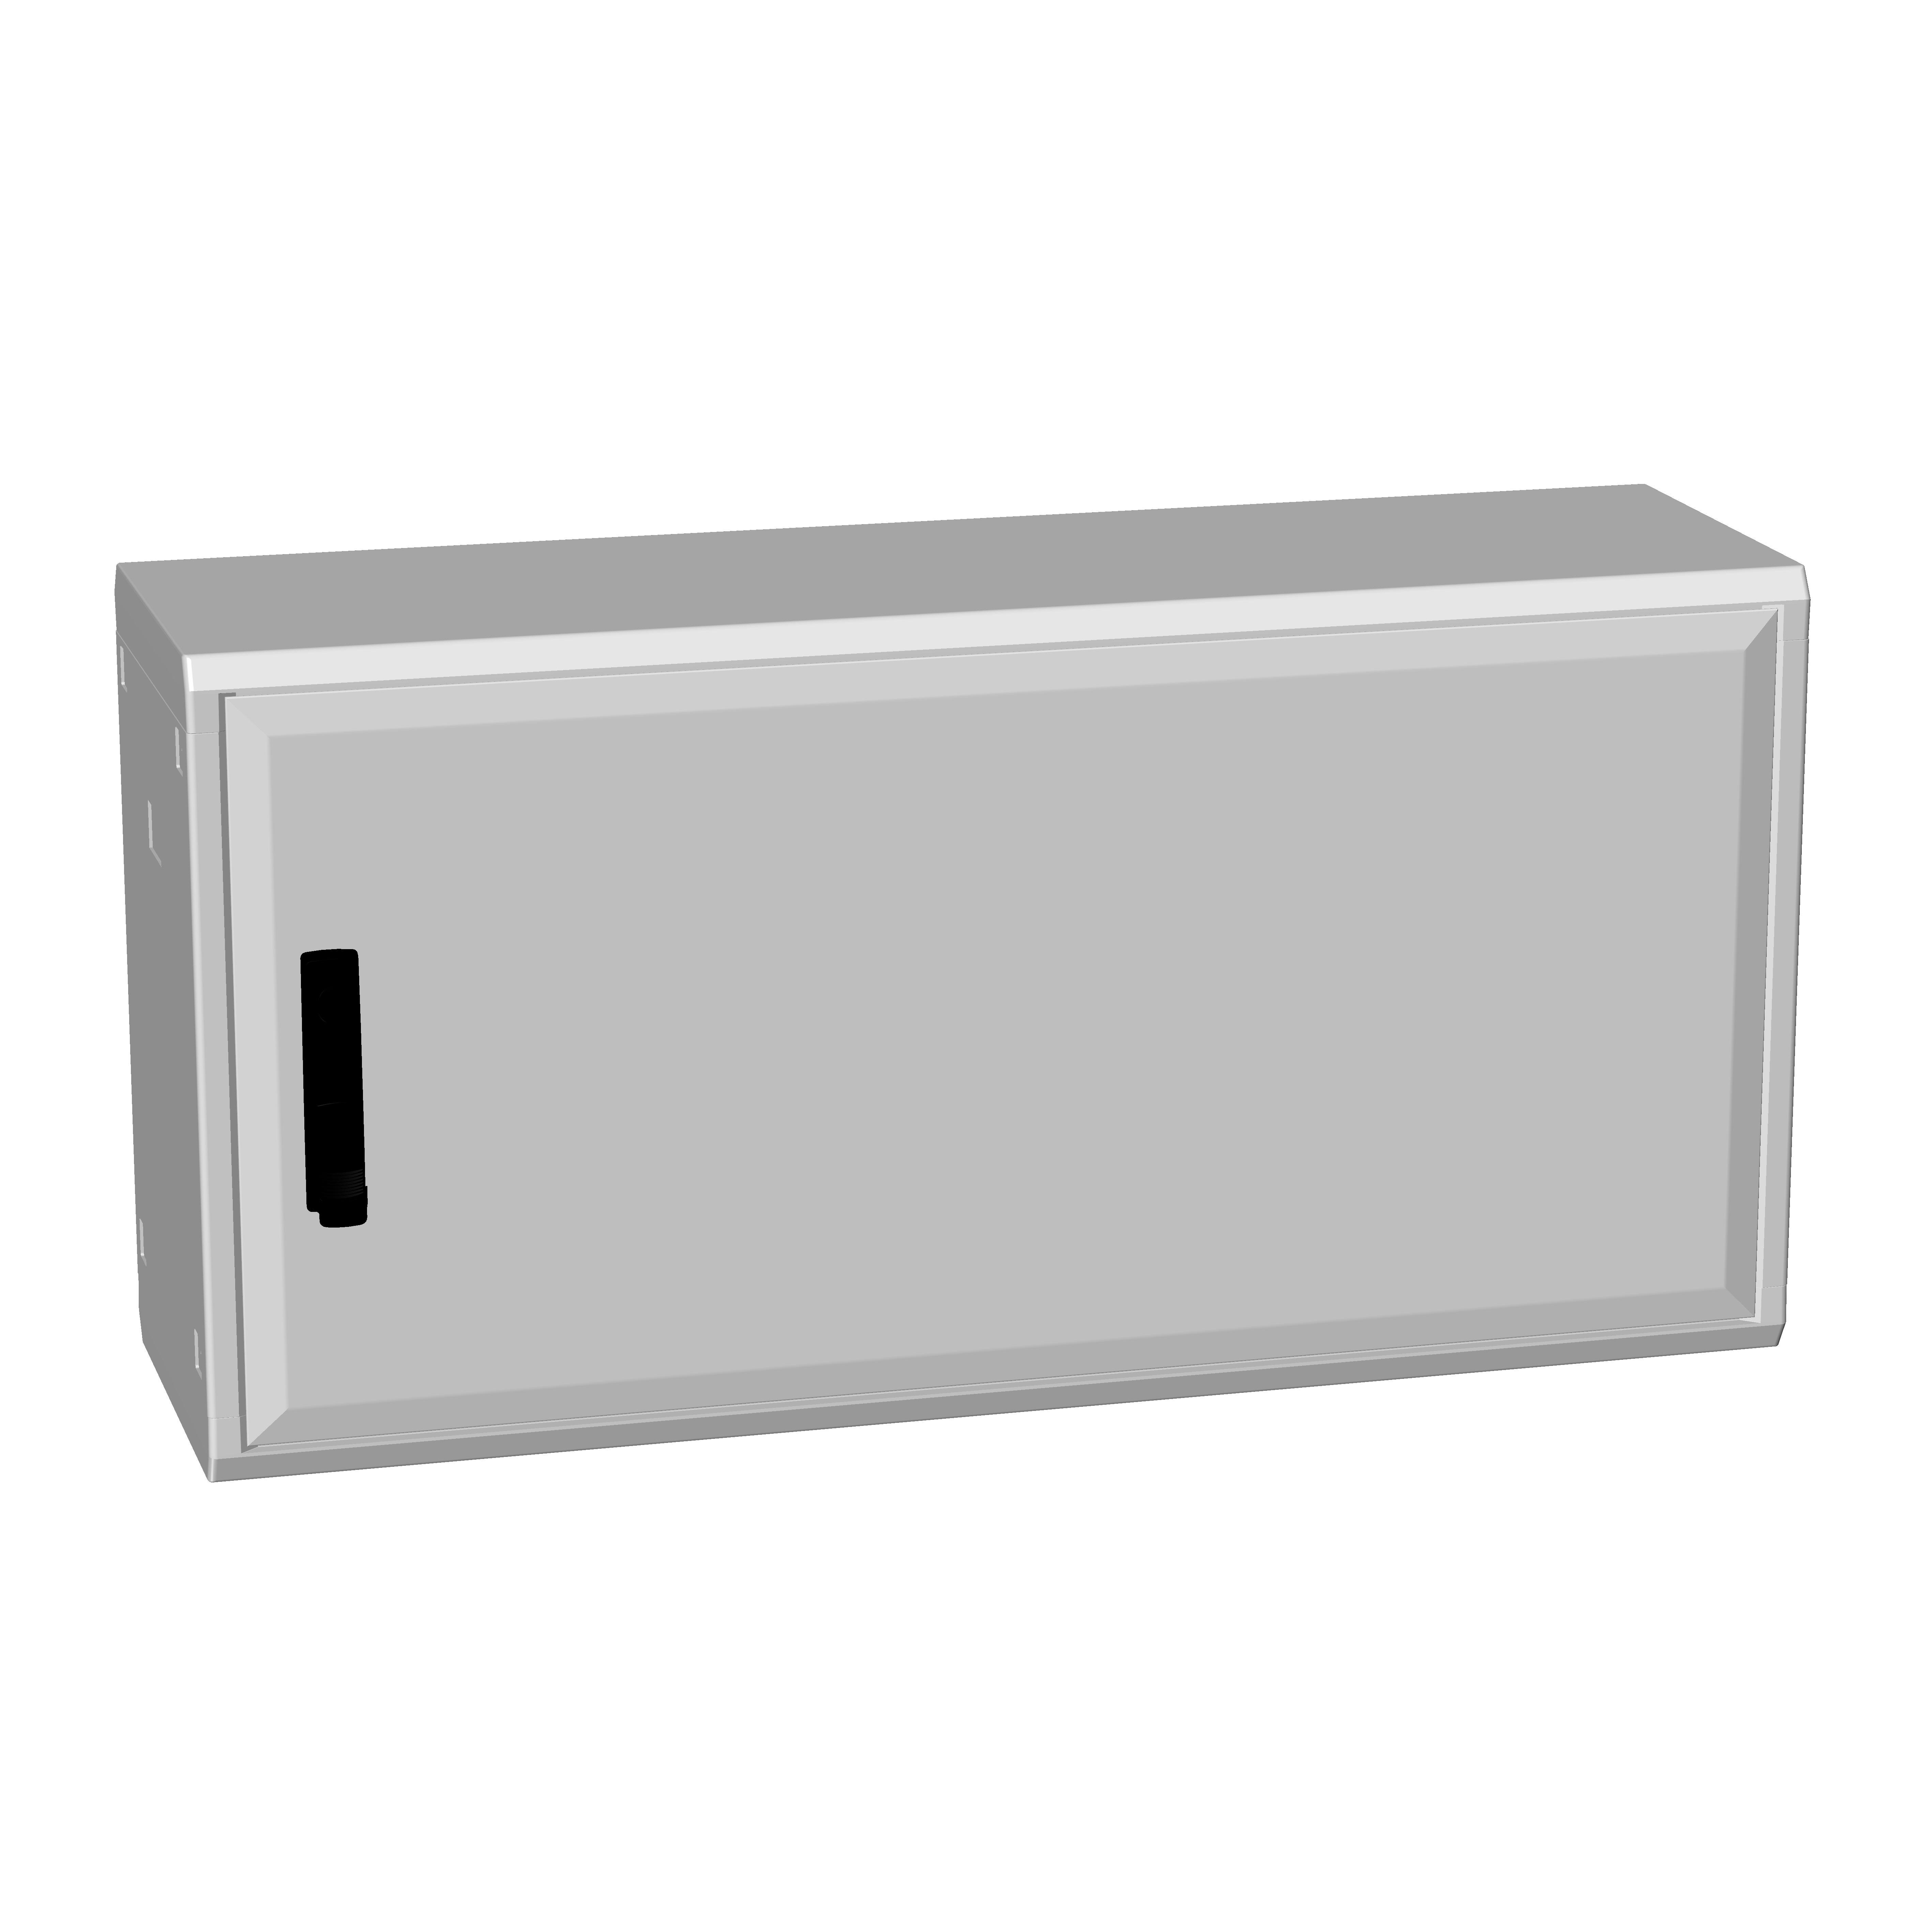 1 Stk Polyesterschrank, eintürig, 500x1000x312 POCC2430--